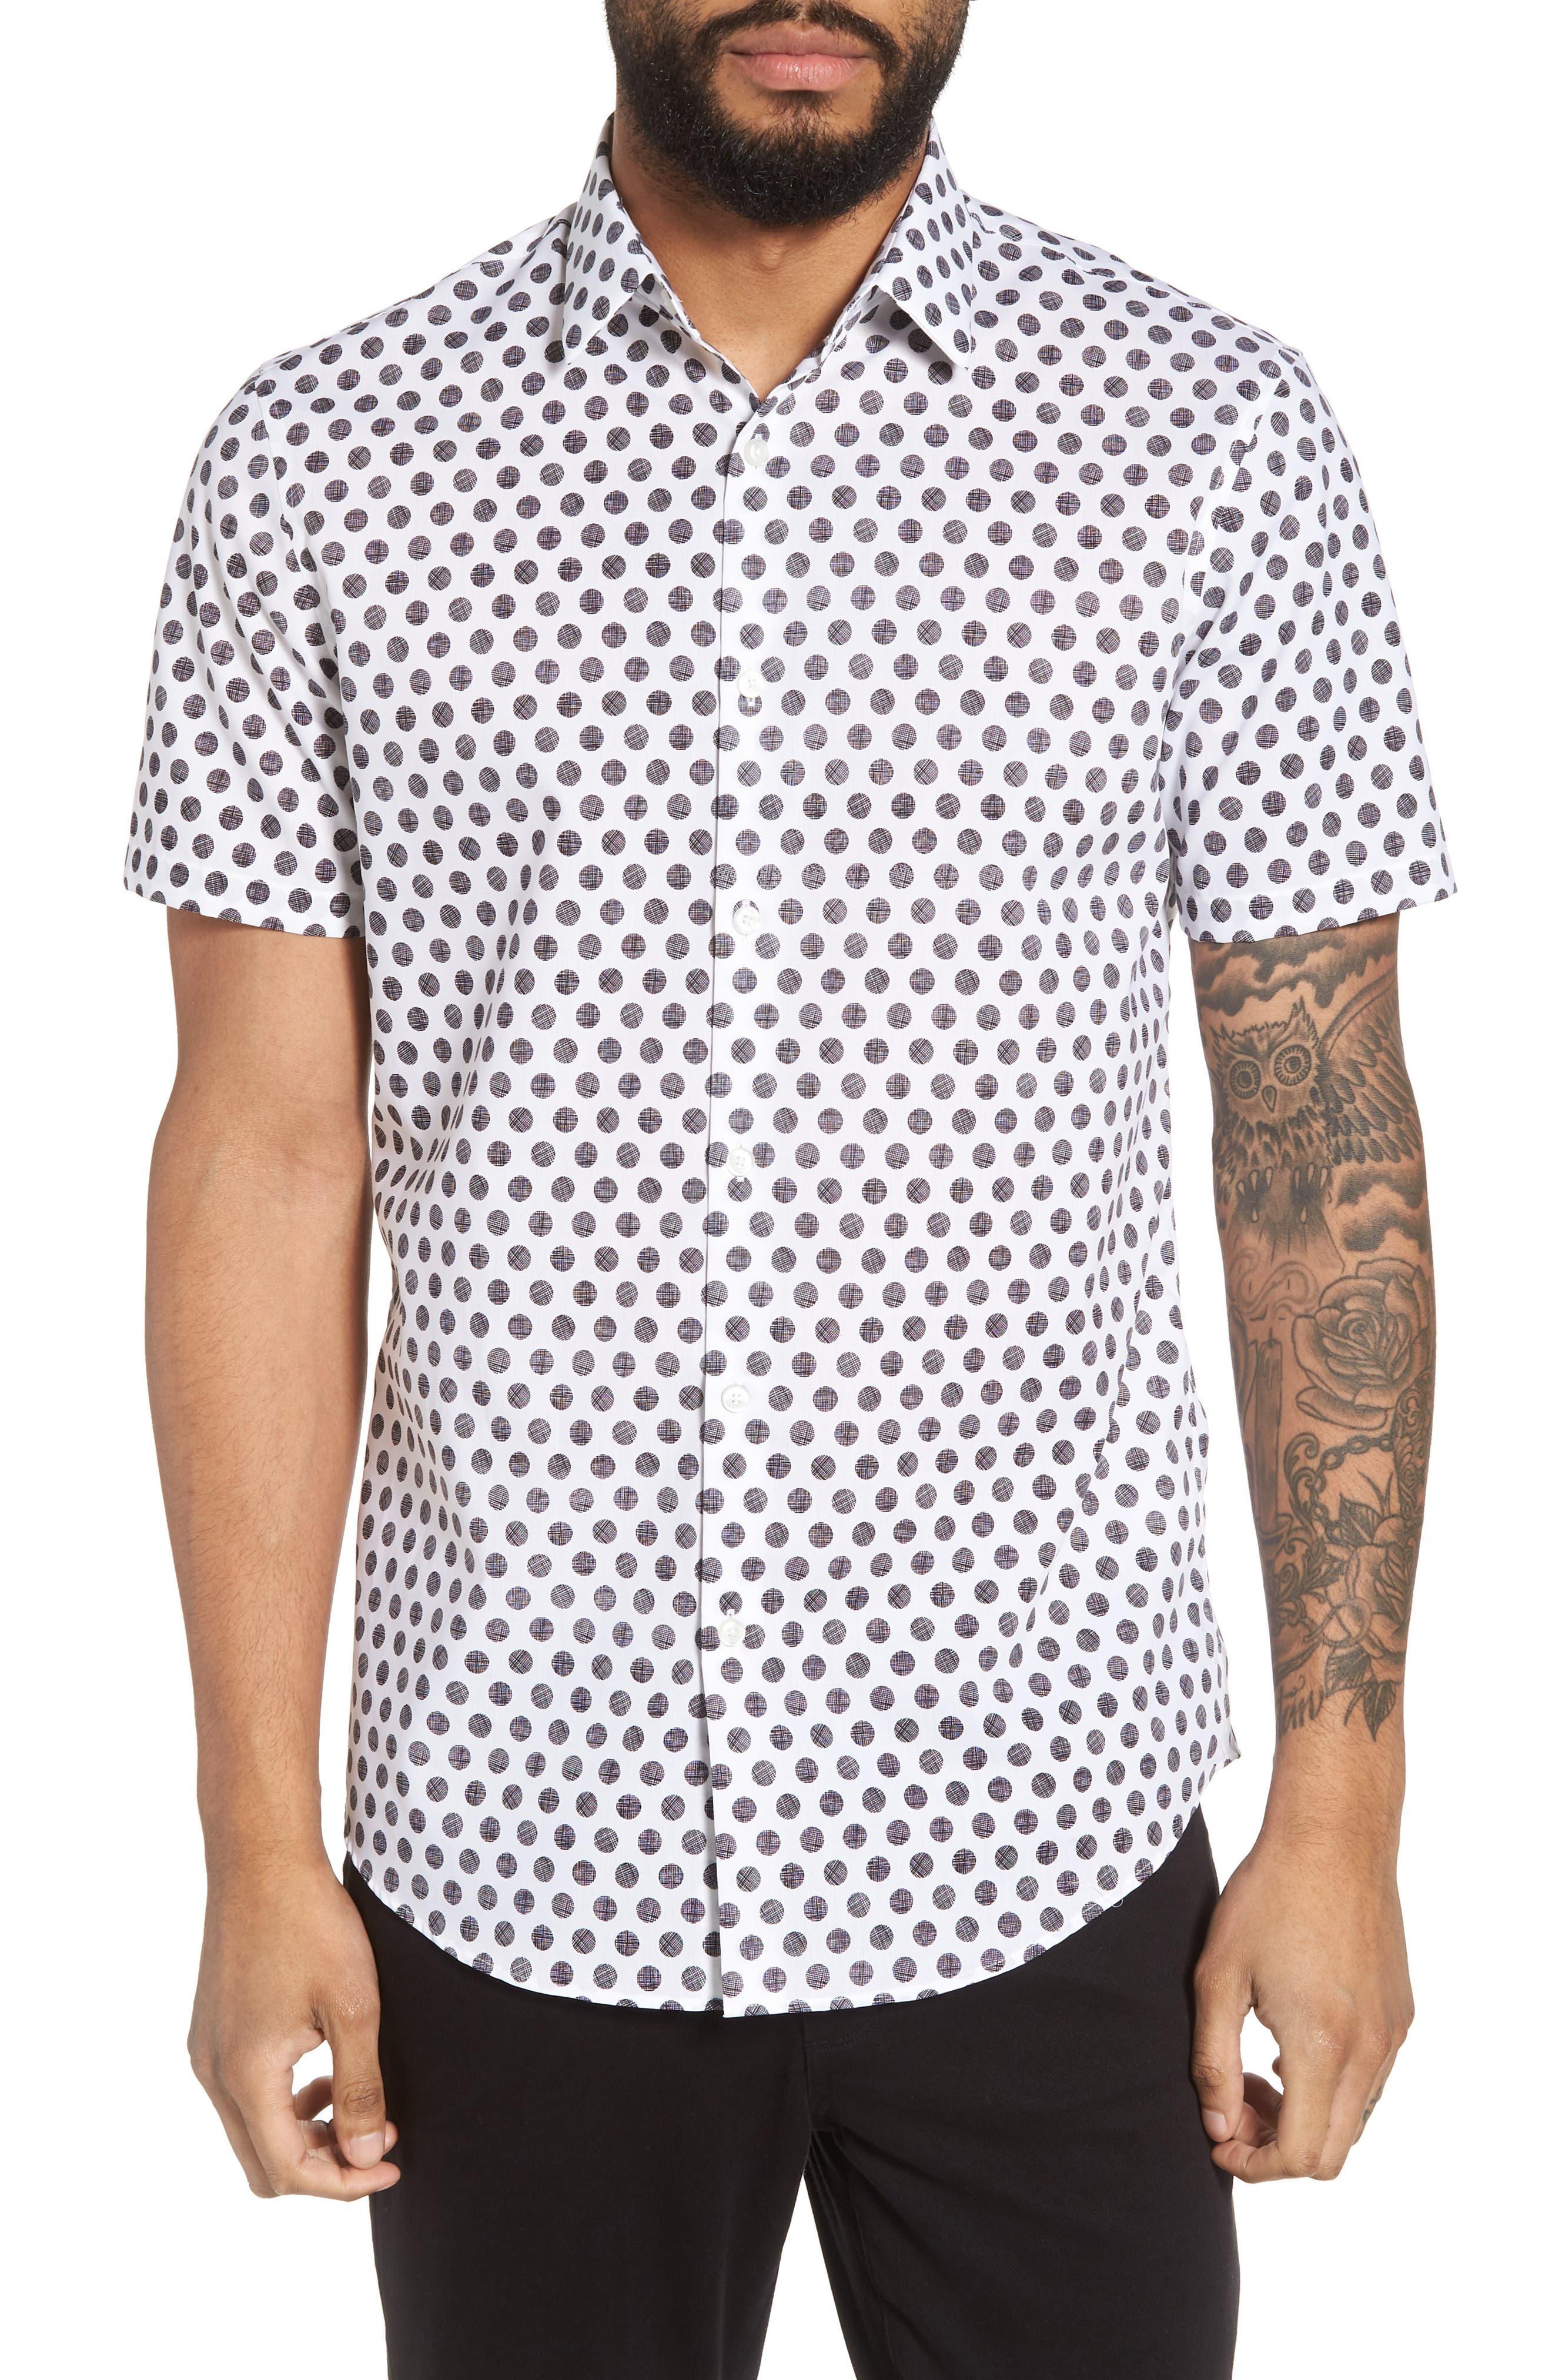 Dot Sport Shirt,                             Main thumbnail 1, color,                             White Black Hatch Dot